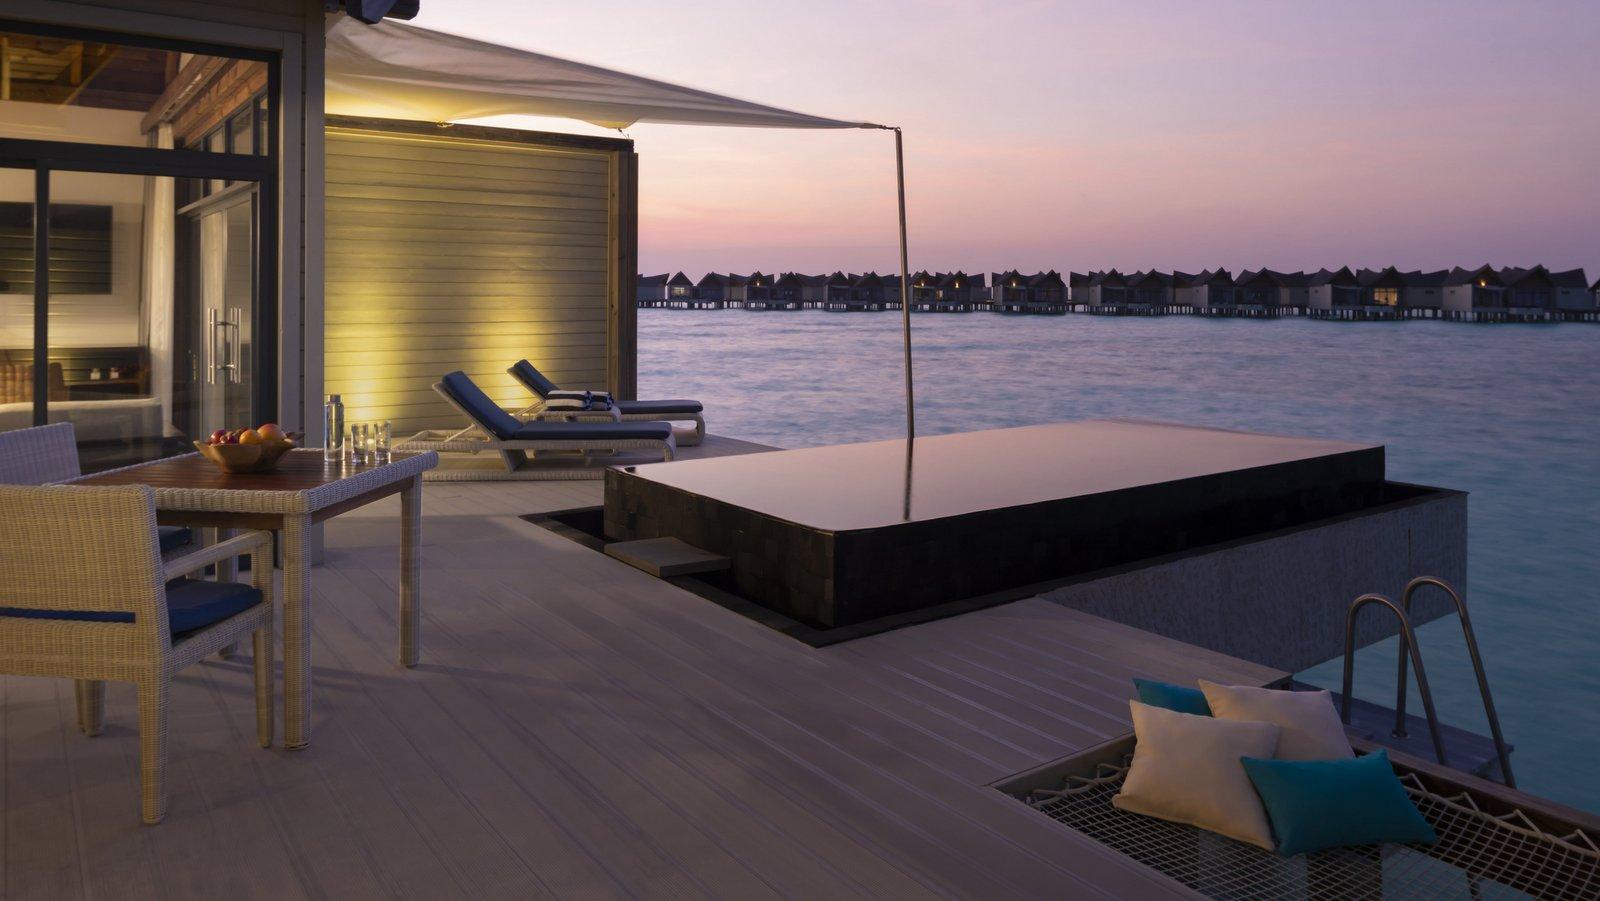 Мальдивы, отель Movenpick Resort Kuredhivaru Maldives, номер Overwater Pool Villa